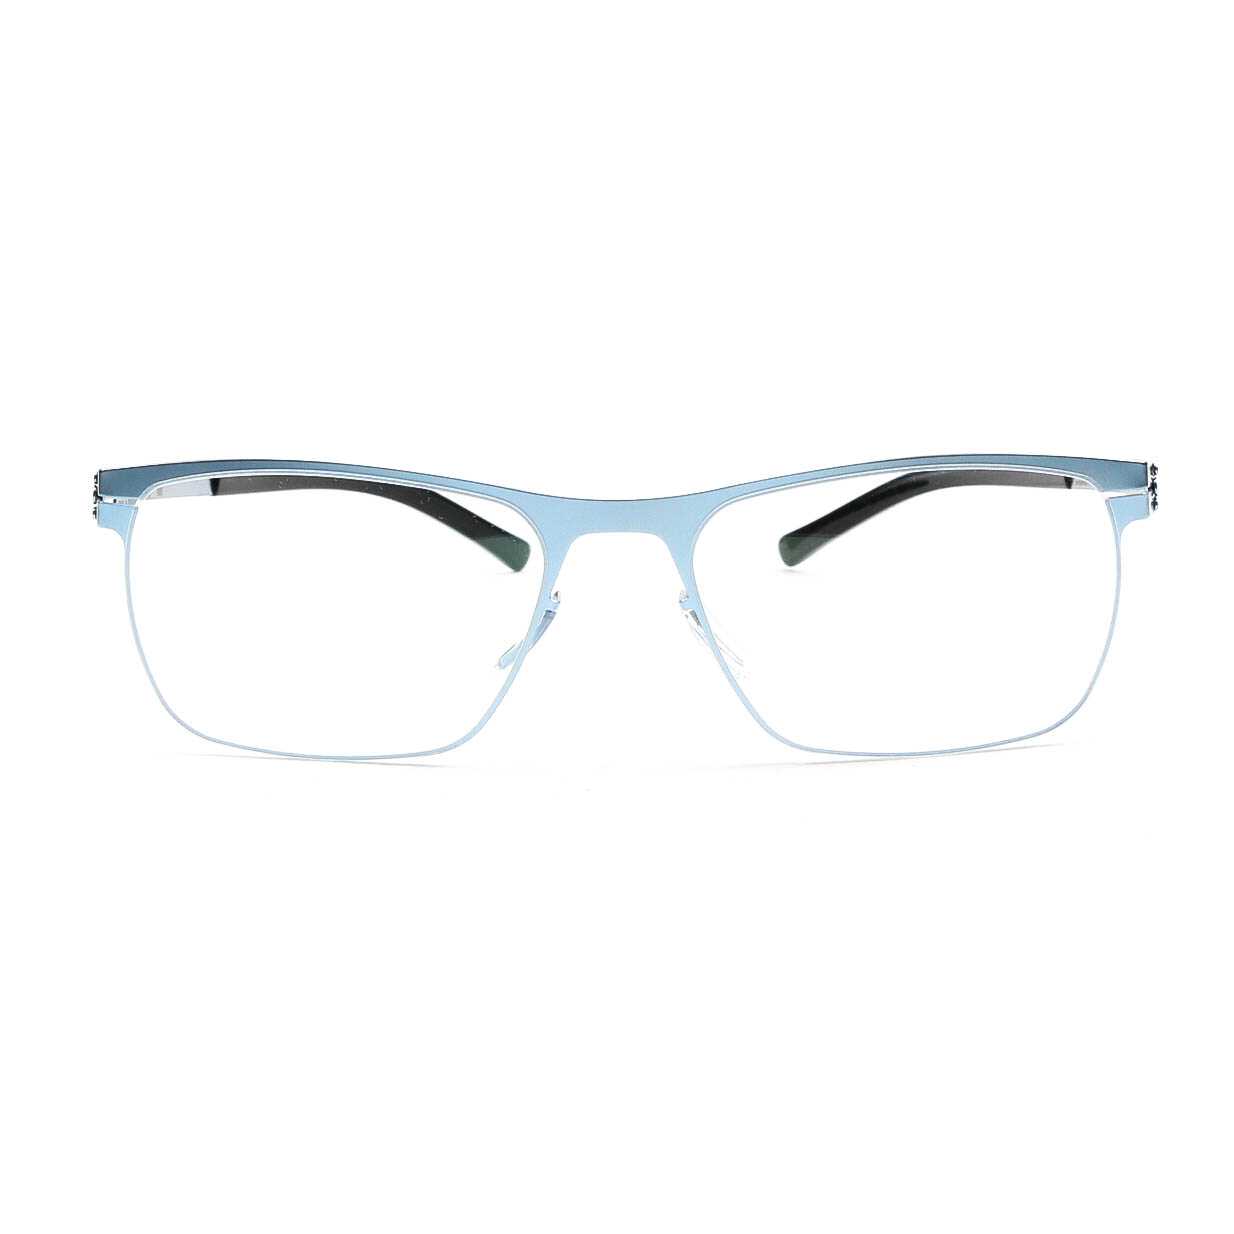 Ic Berlin Eyeglasses Frames Model Wissam : ic! berlin M1221 Julius Eyeglasses Electric Light Blue ...